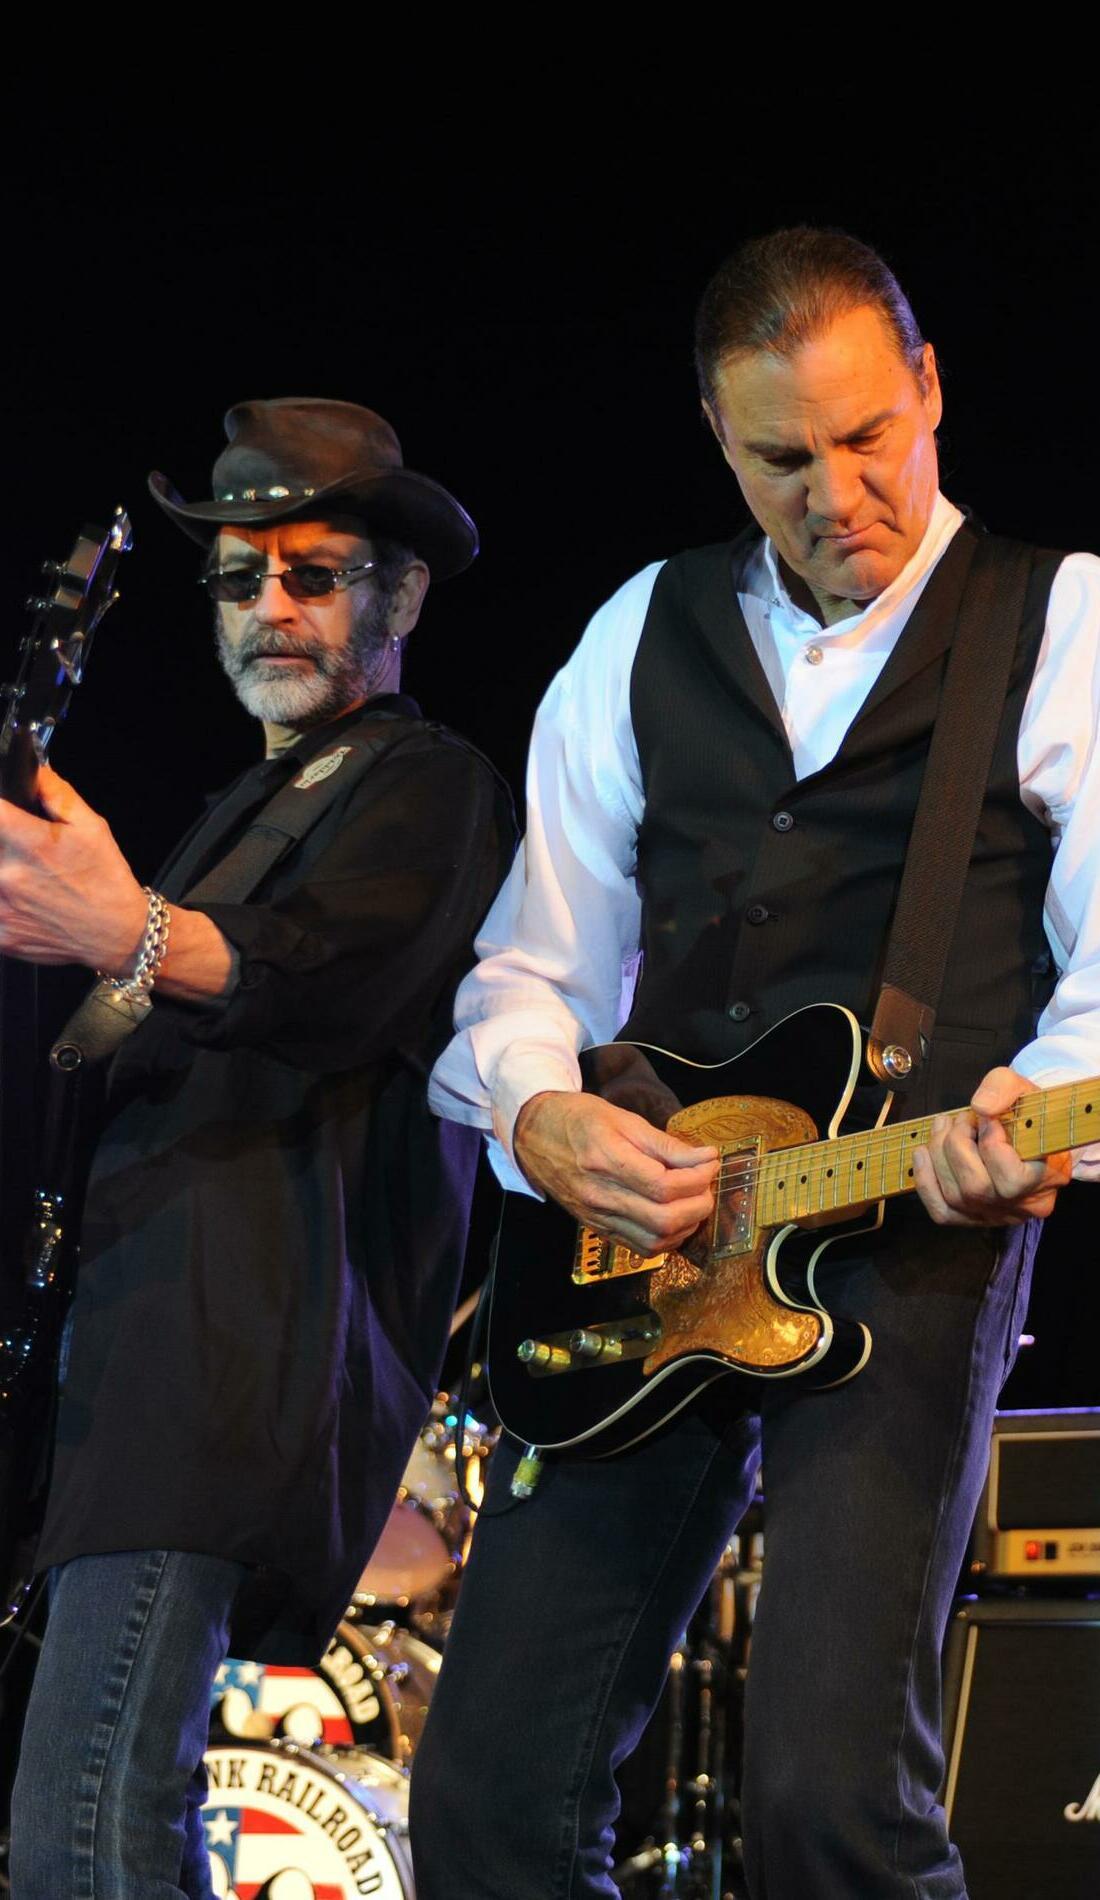 A Grand Funk Railroad live event